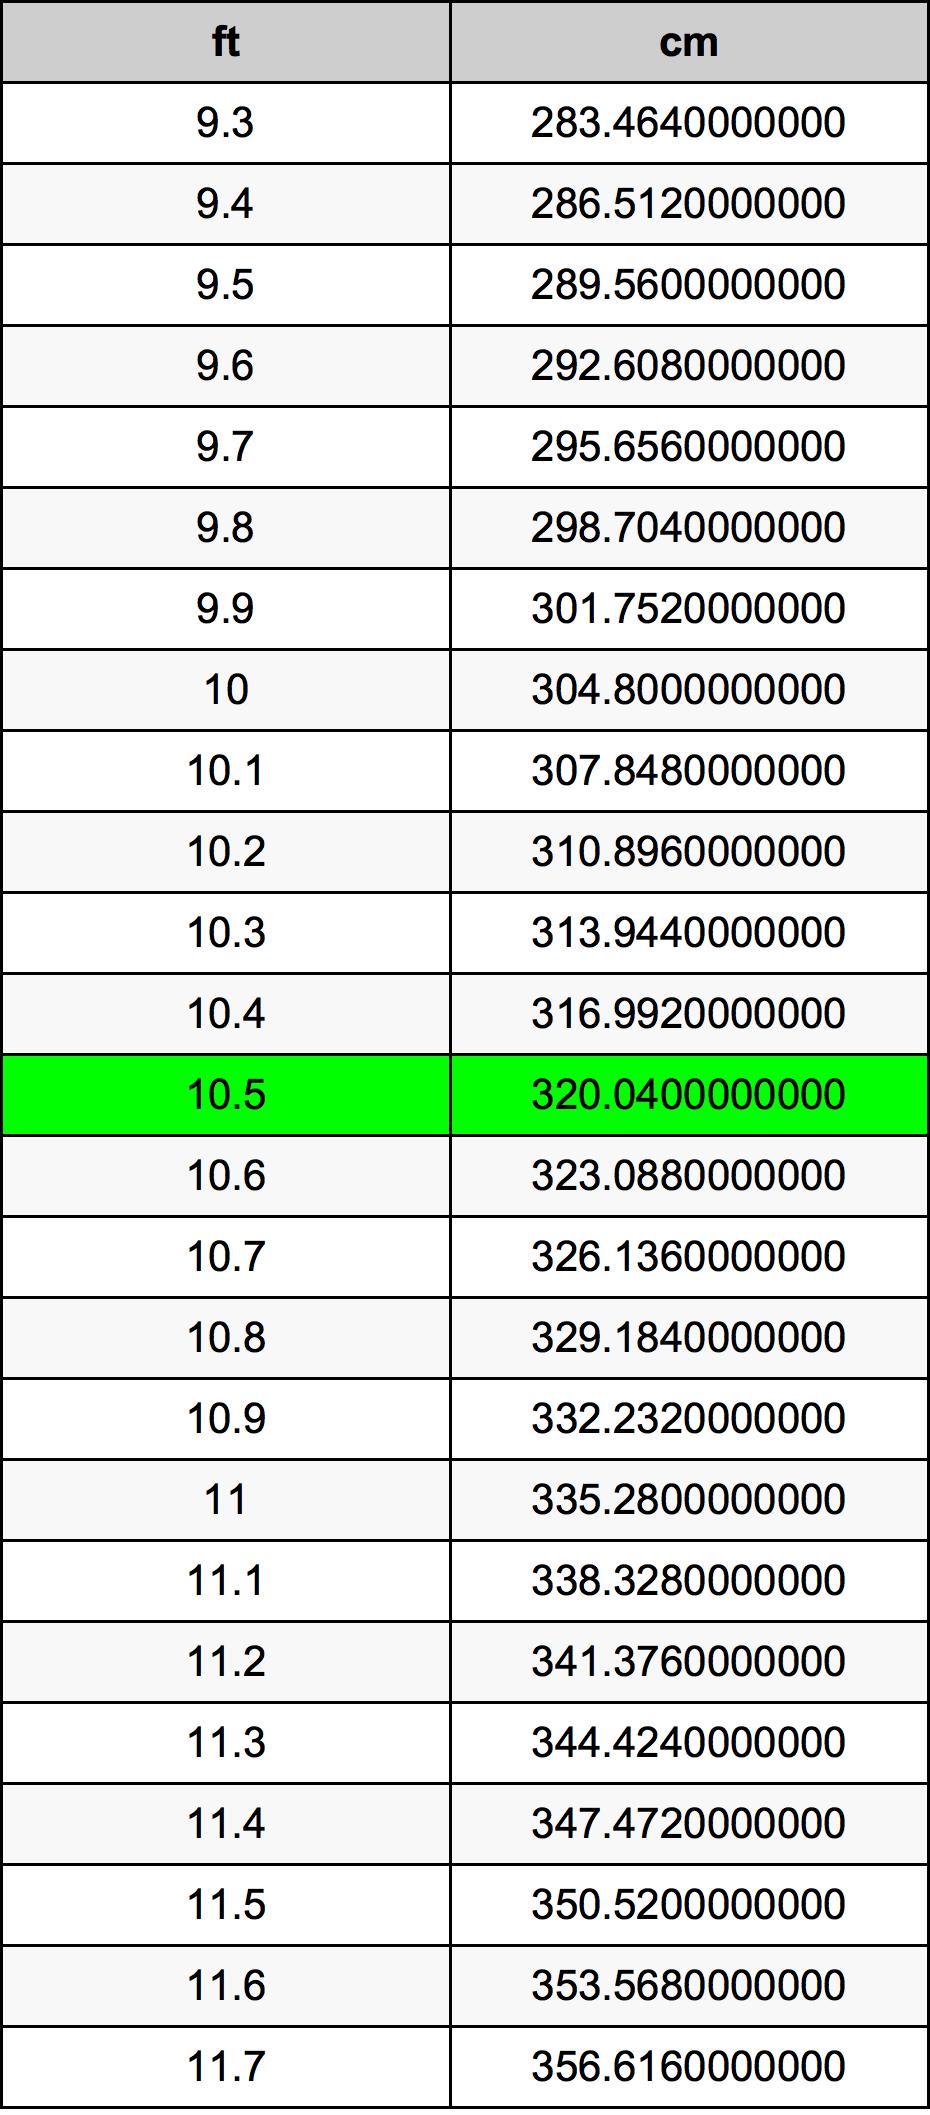 10.5 Feet To Centimeters Converter | 10.5 ft To cm Converter